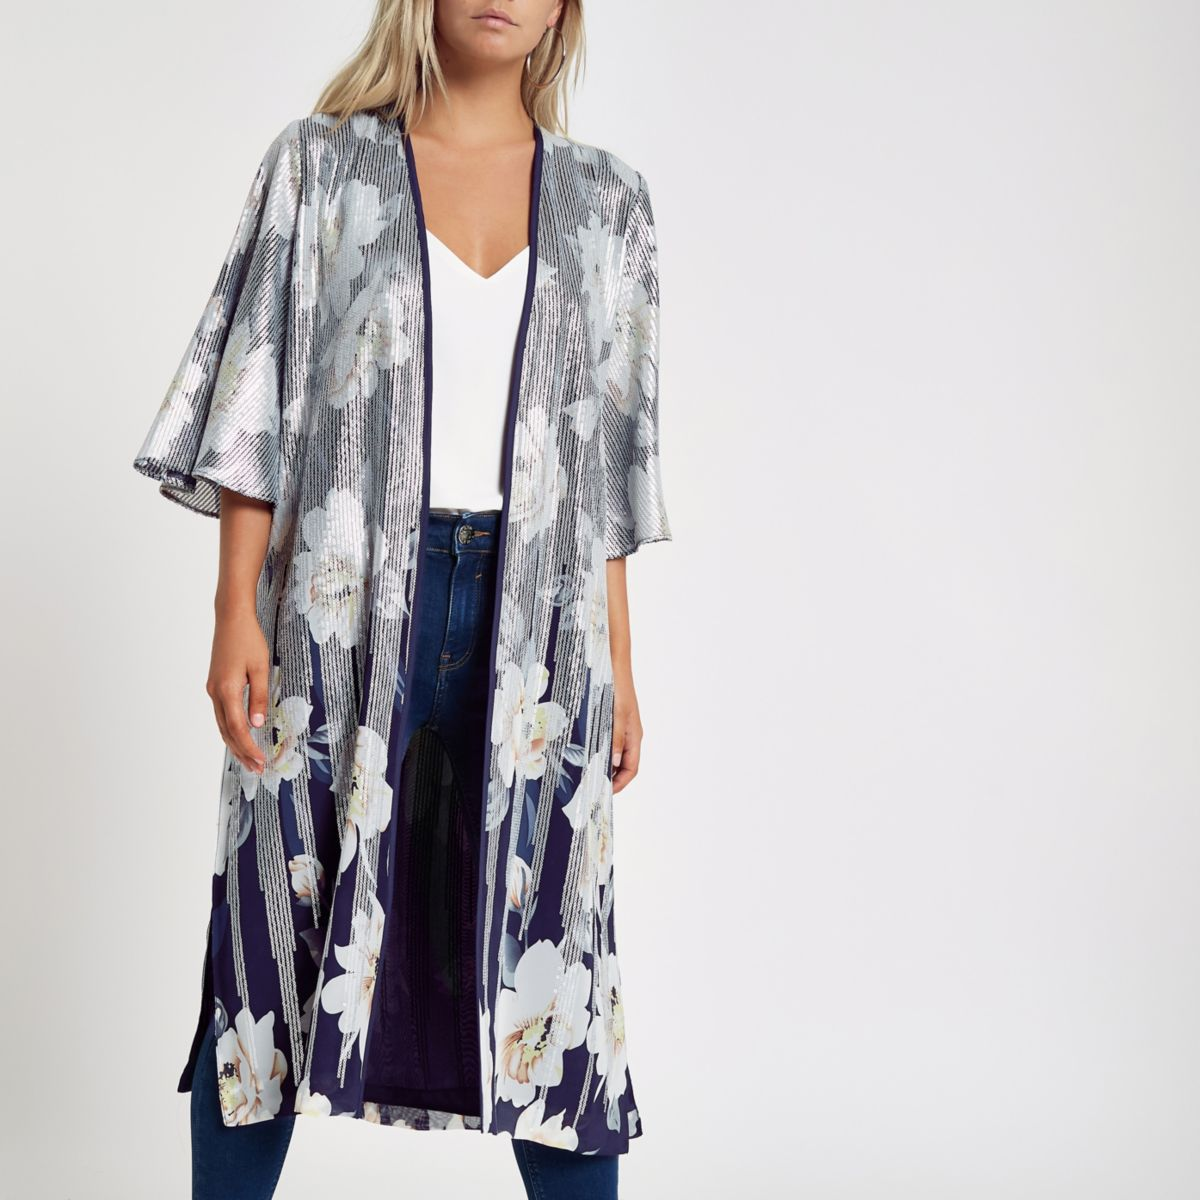 Petite navy floral sequin duster coat